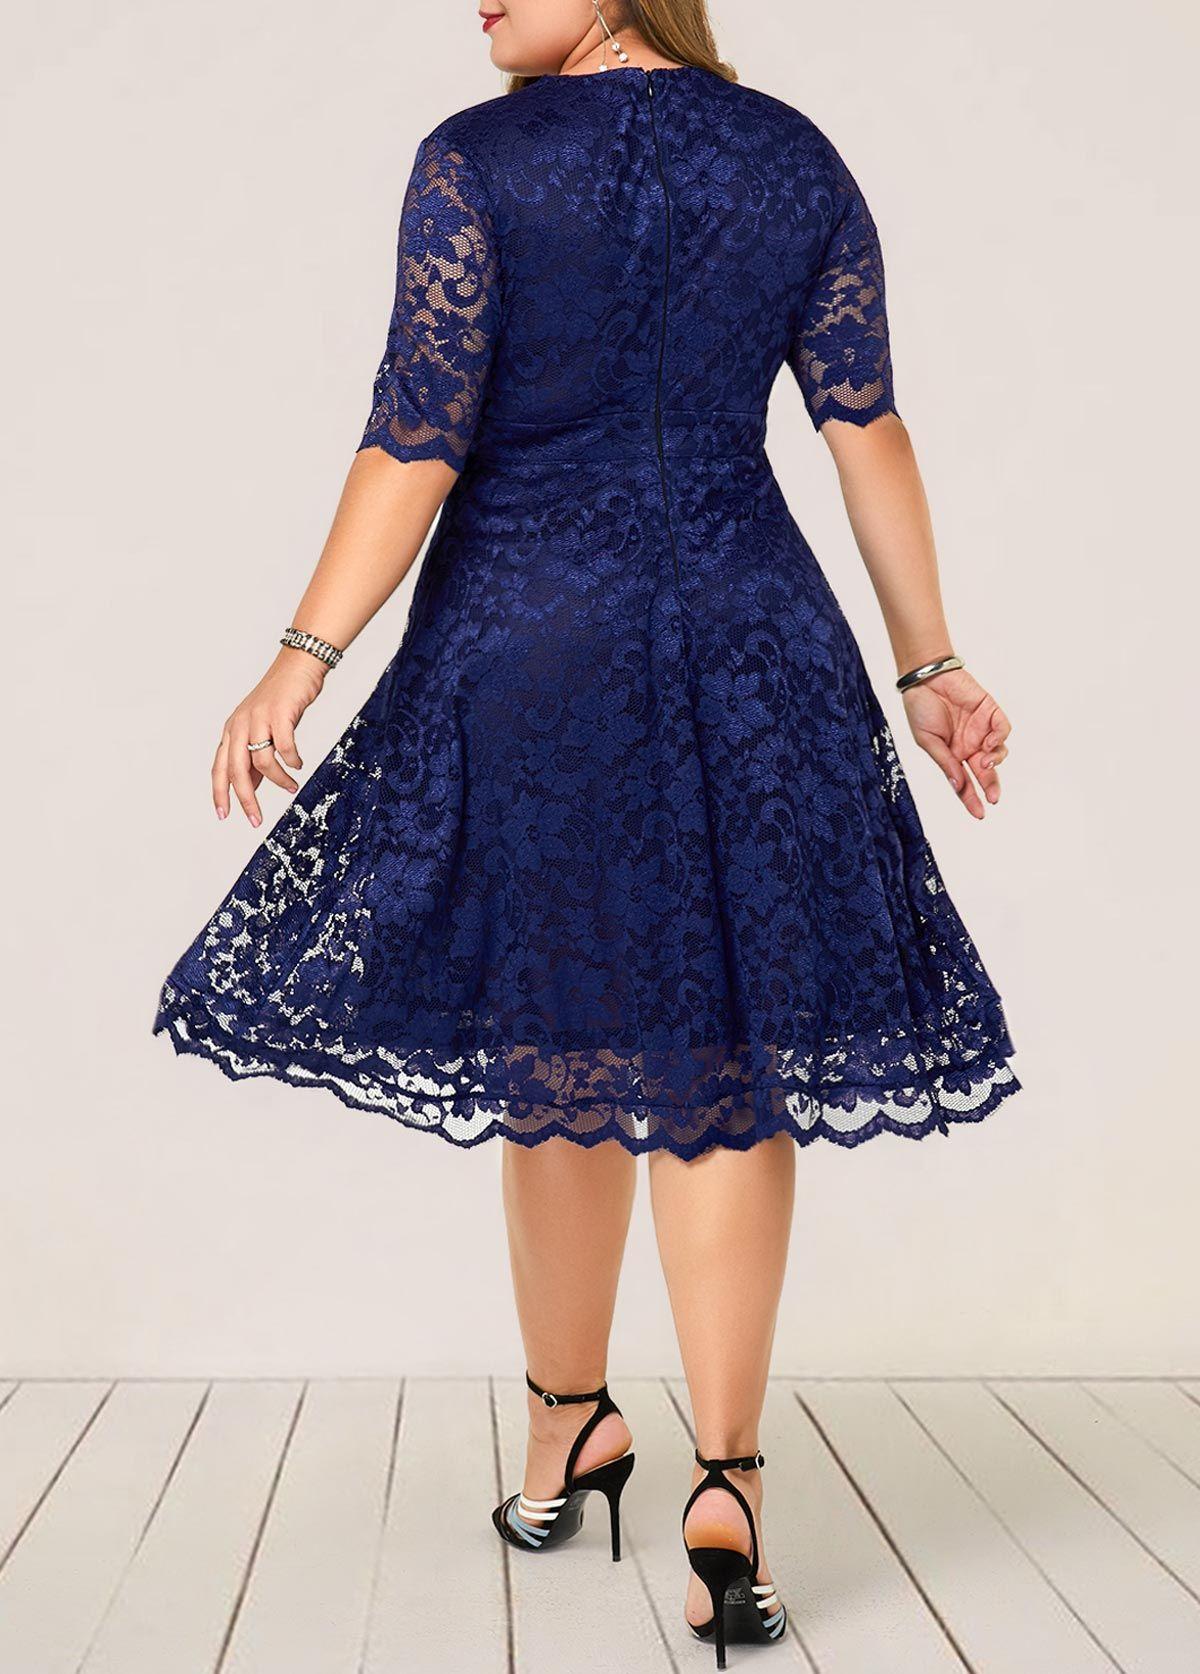 32+ Plus size navy lace dress info